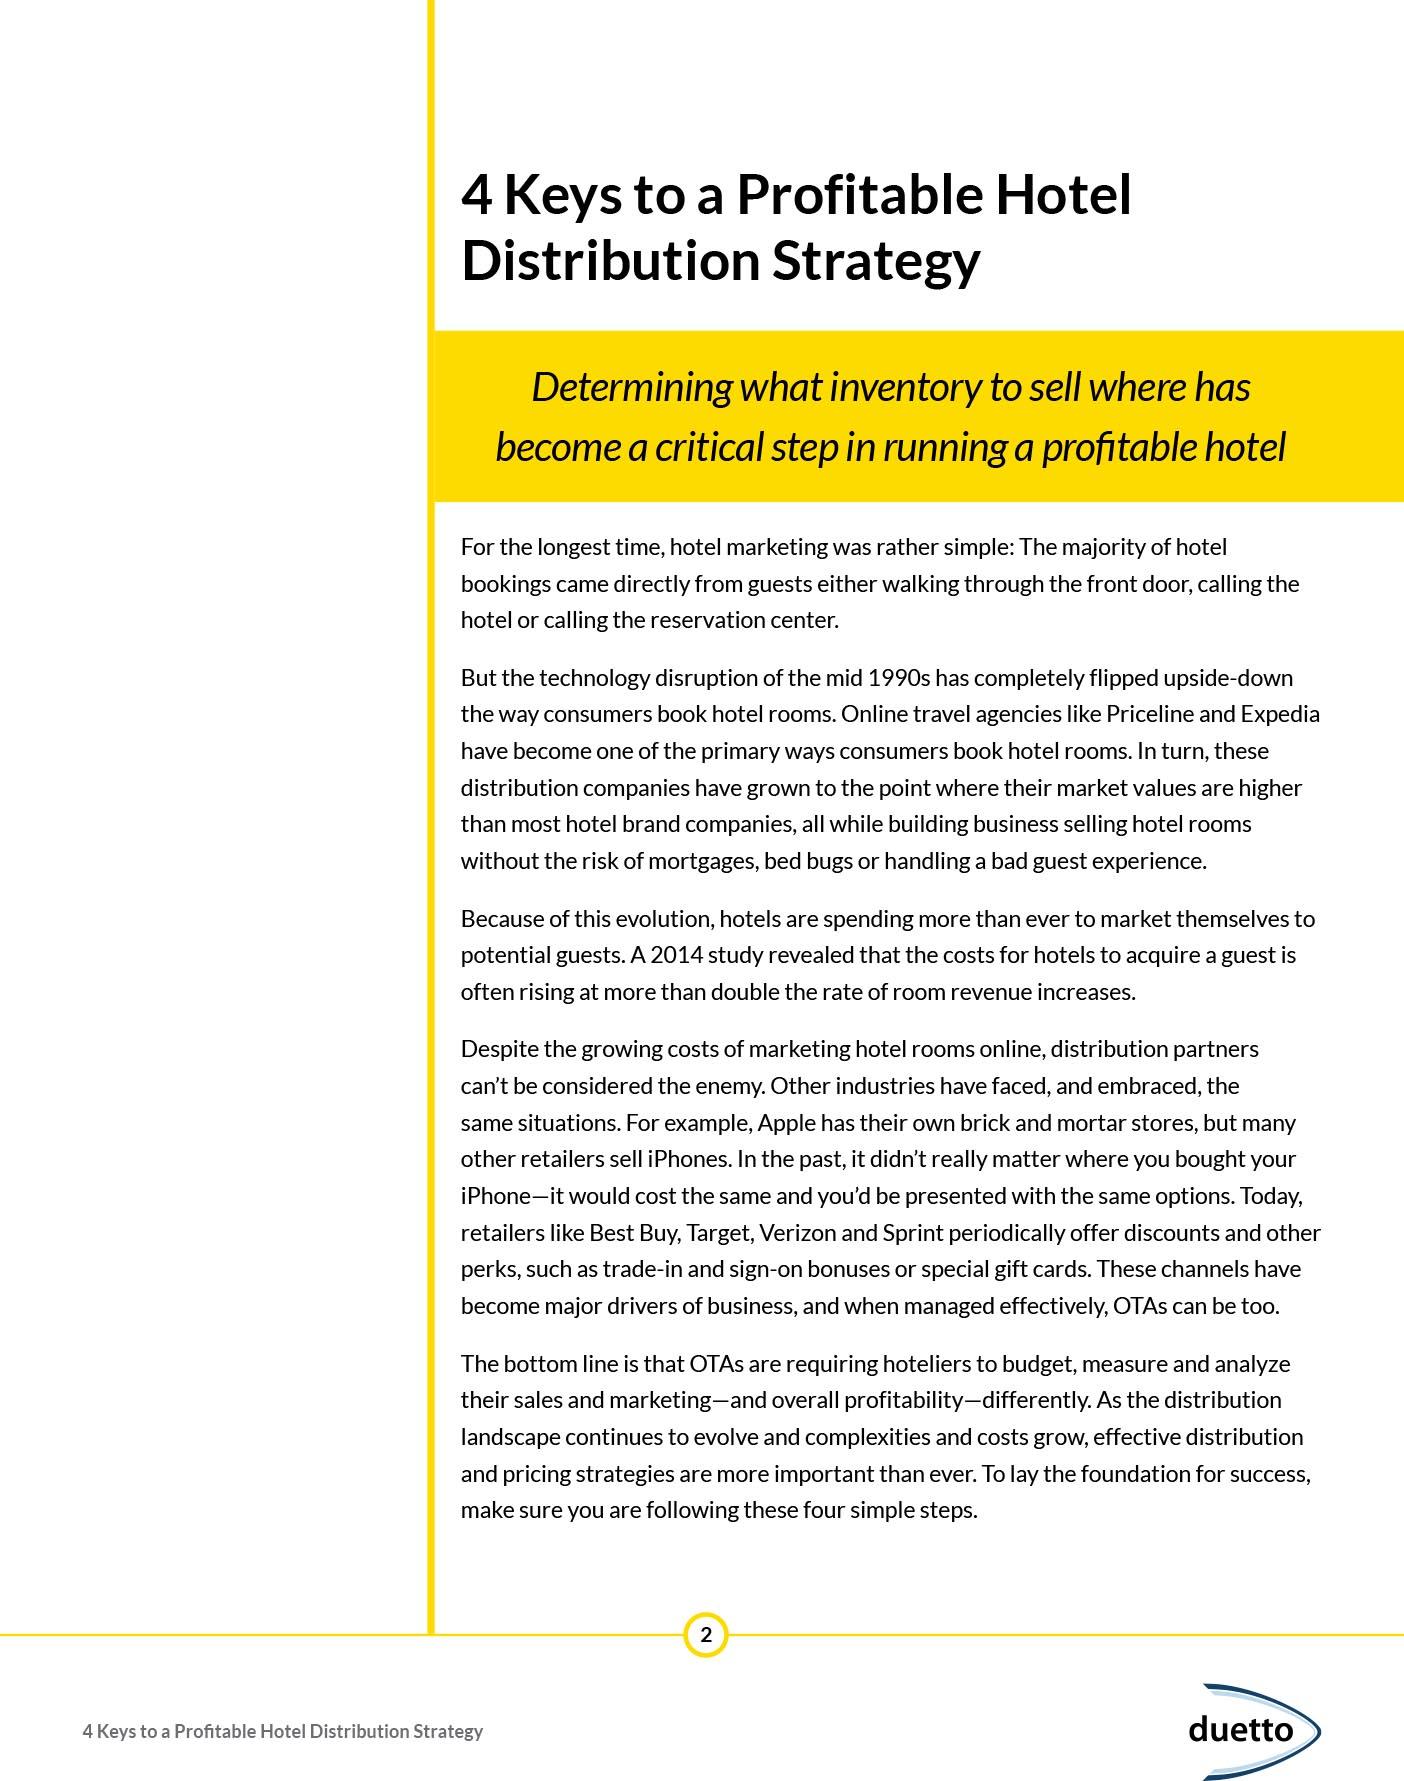 2 4-keys-to-a-profitable-hotel-distribution-strategy-2.jpg